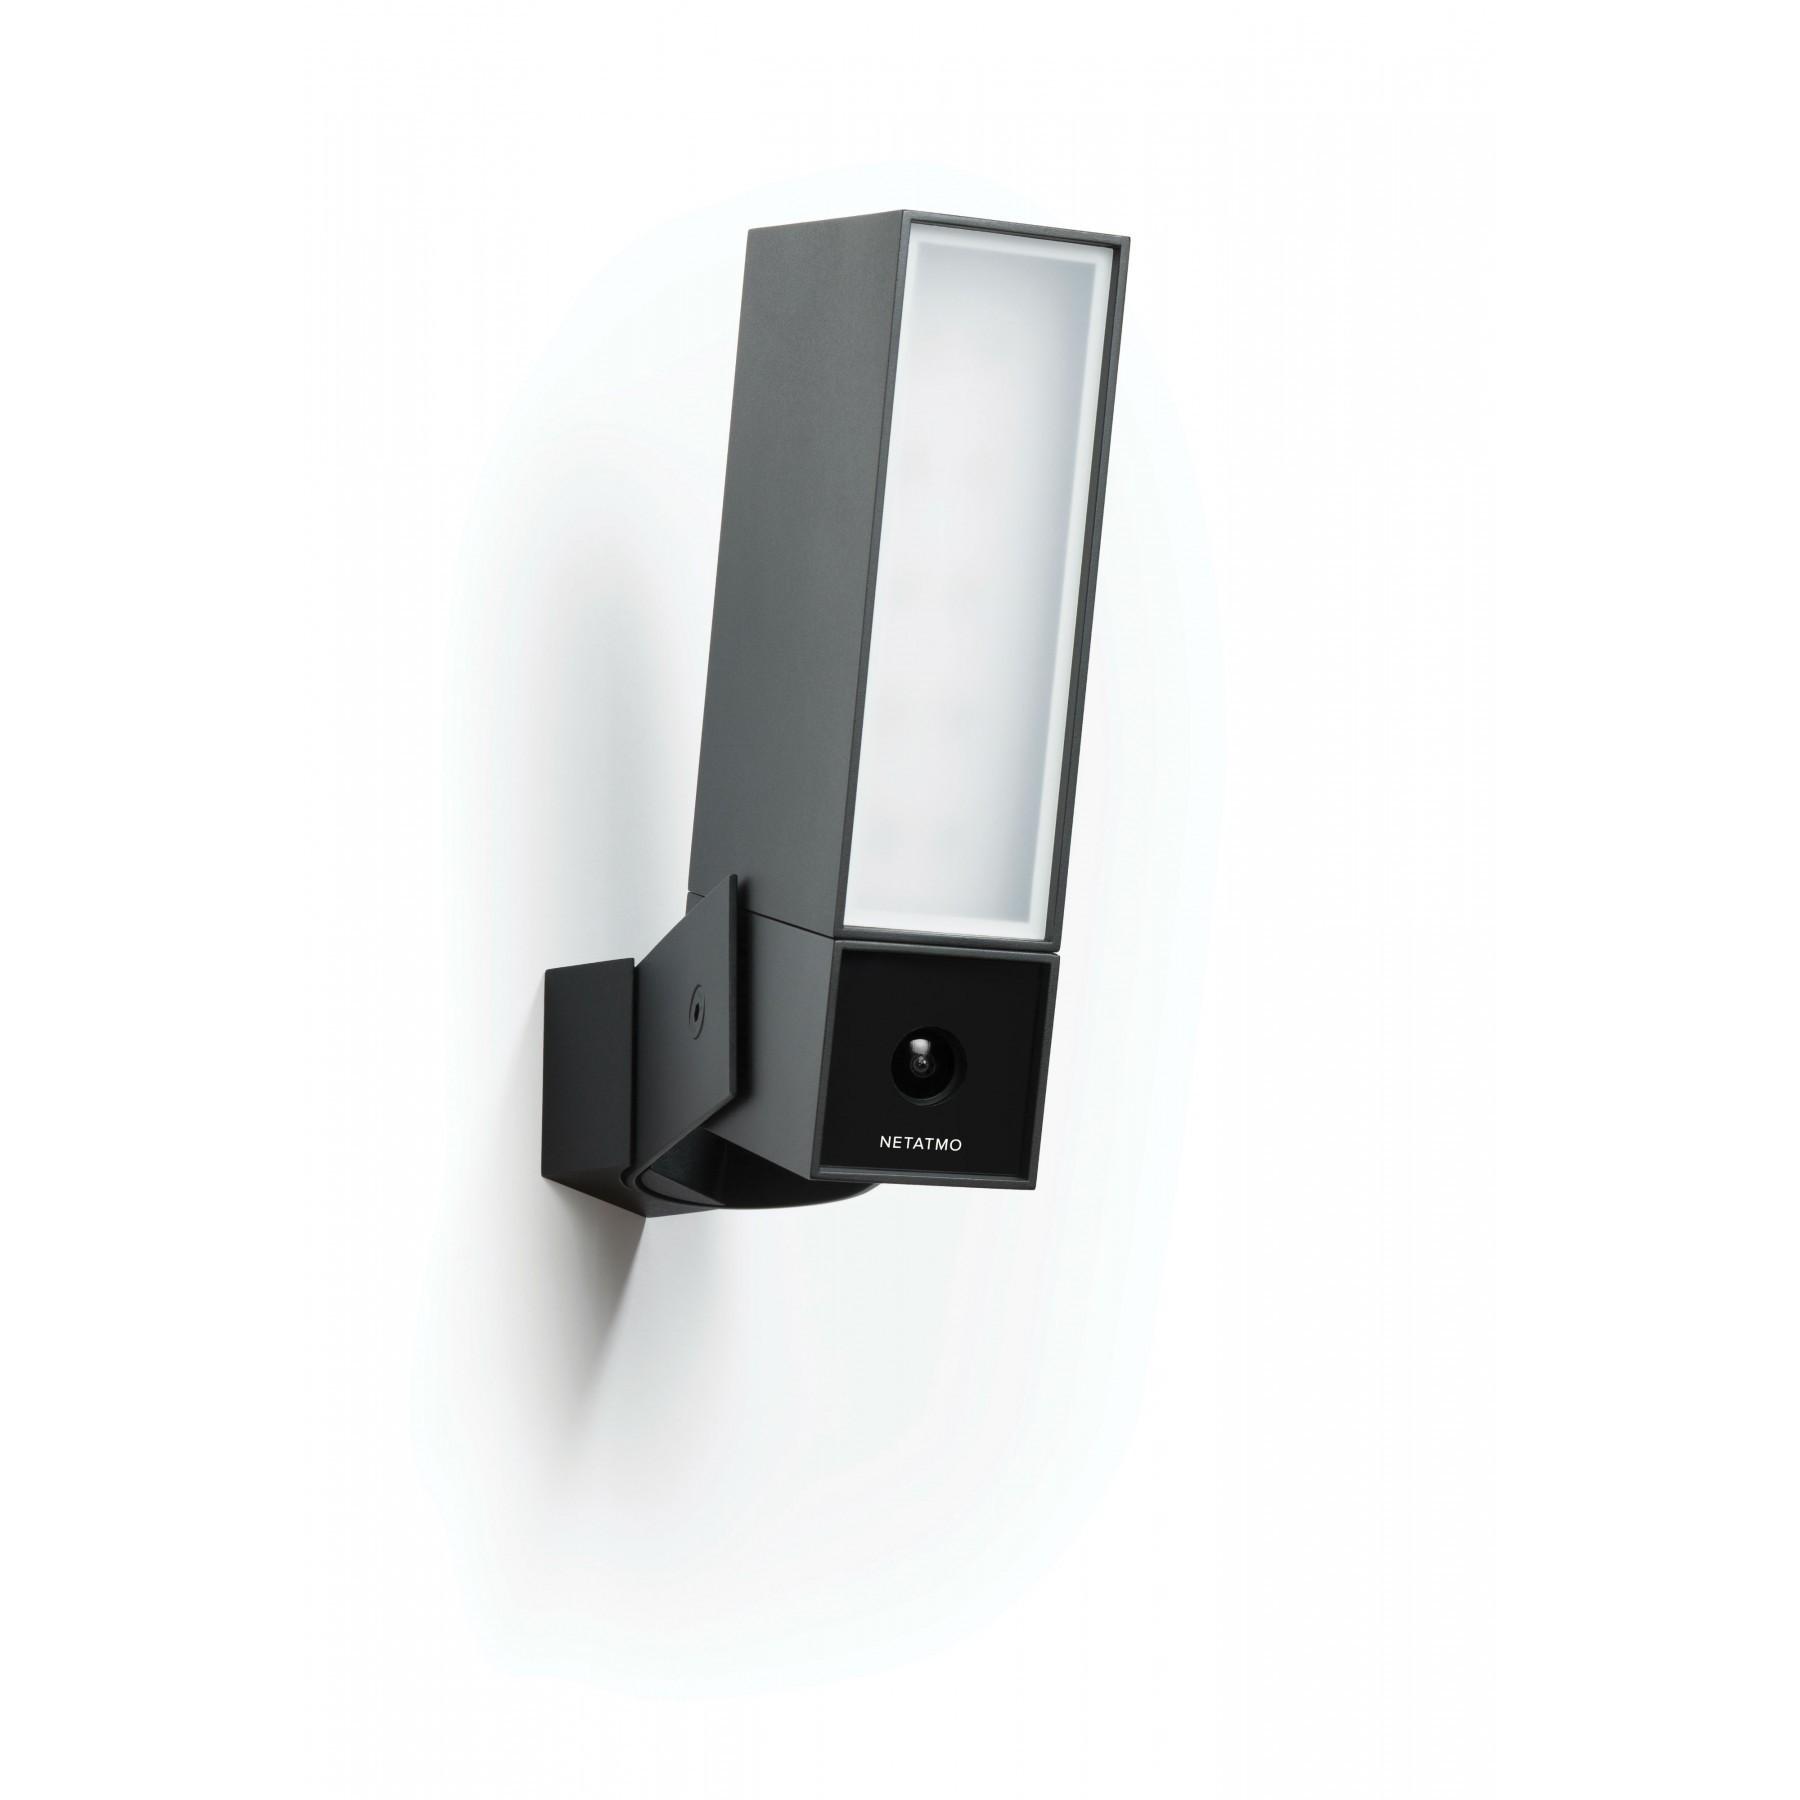 venkovn bezpe nostn kamera netatmo presence istyle. Black Bedroom Furniture Sets. Home Design Ideas